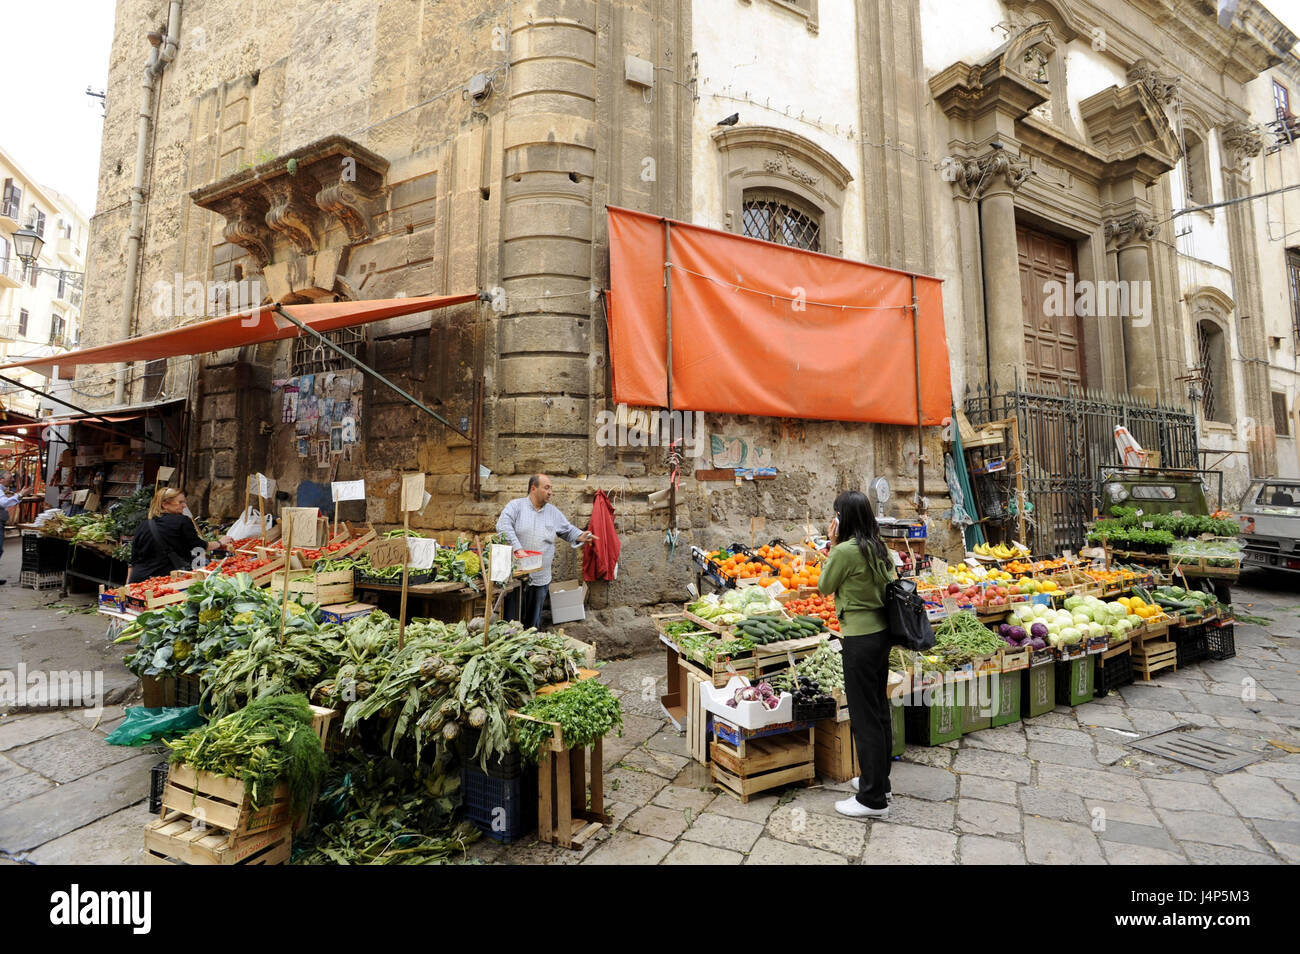 Italy, island Sicily, Palermo, Piazza Ballaro, market, - Stock Image